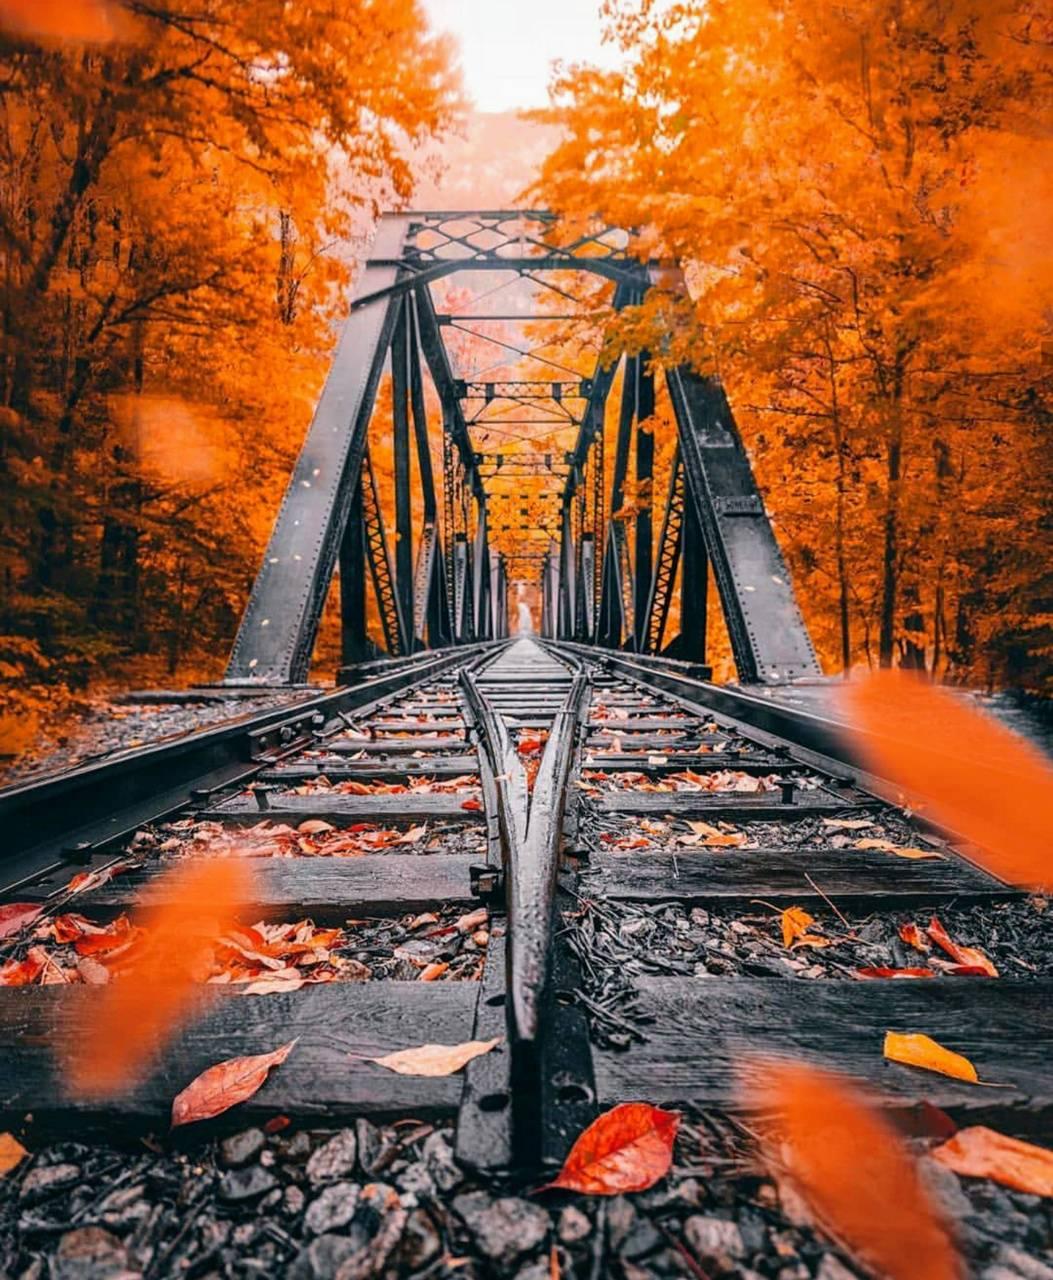 Autumn railroads